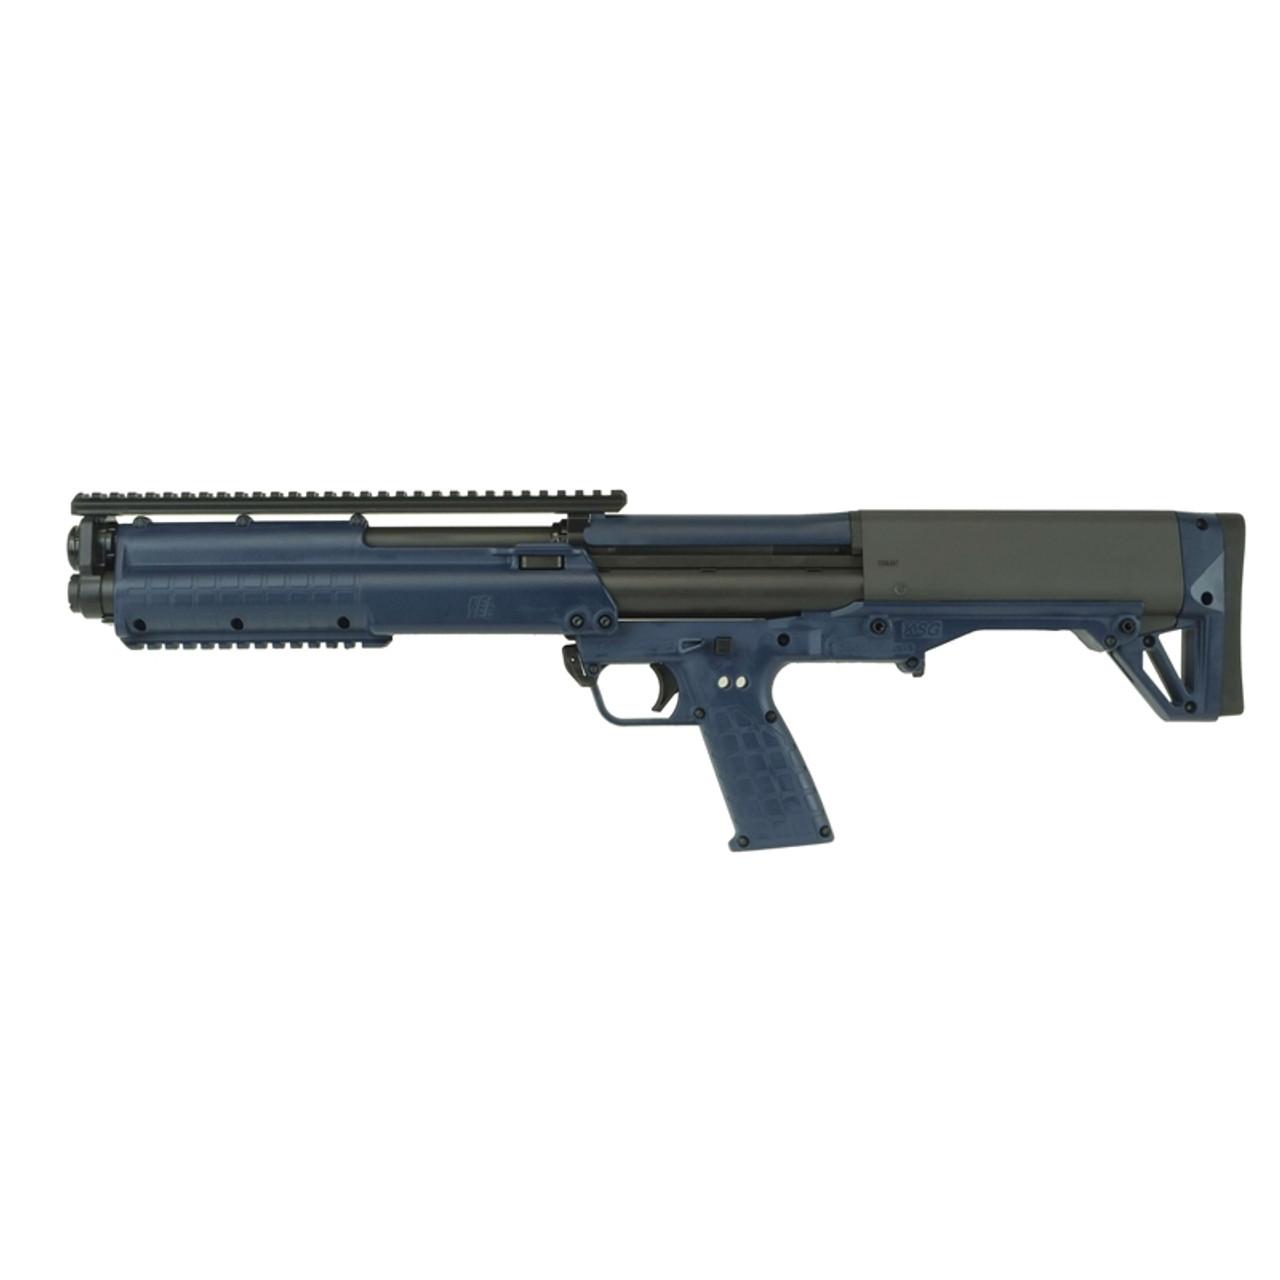 Kel Tec KSG-CALIFORNIA LEGAL- 12ga- Navy Blue